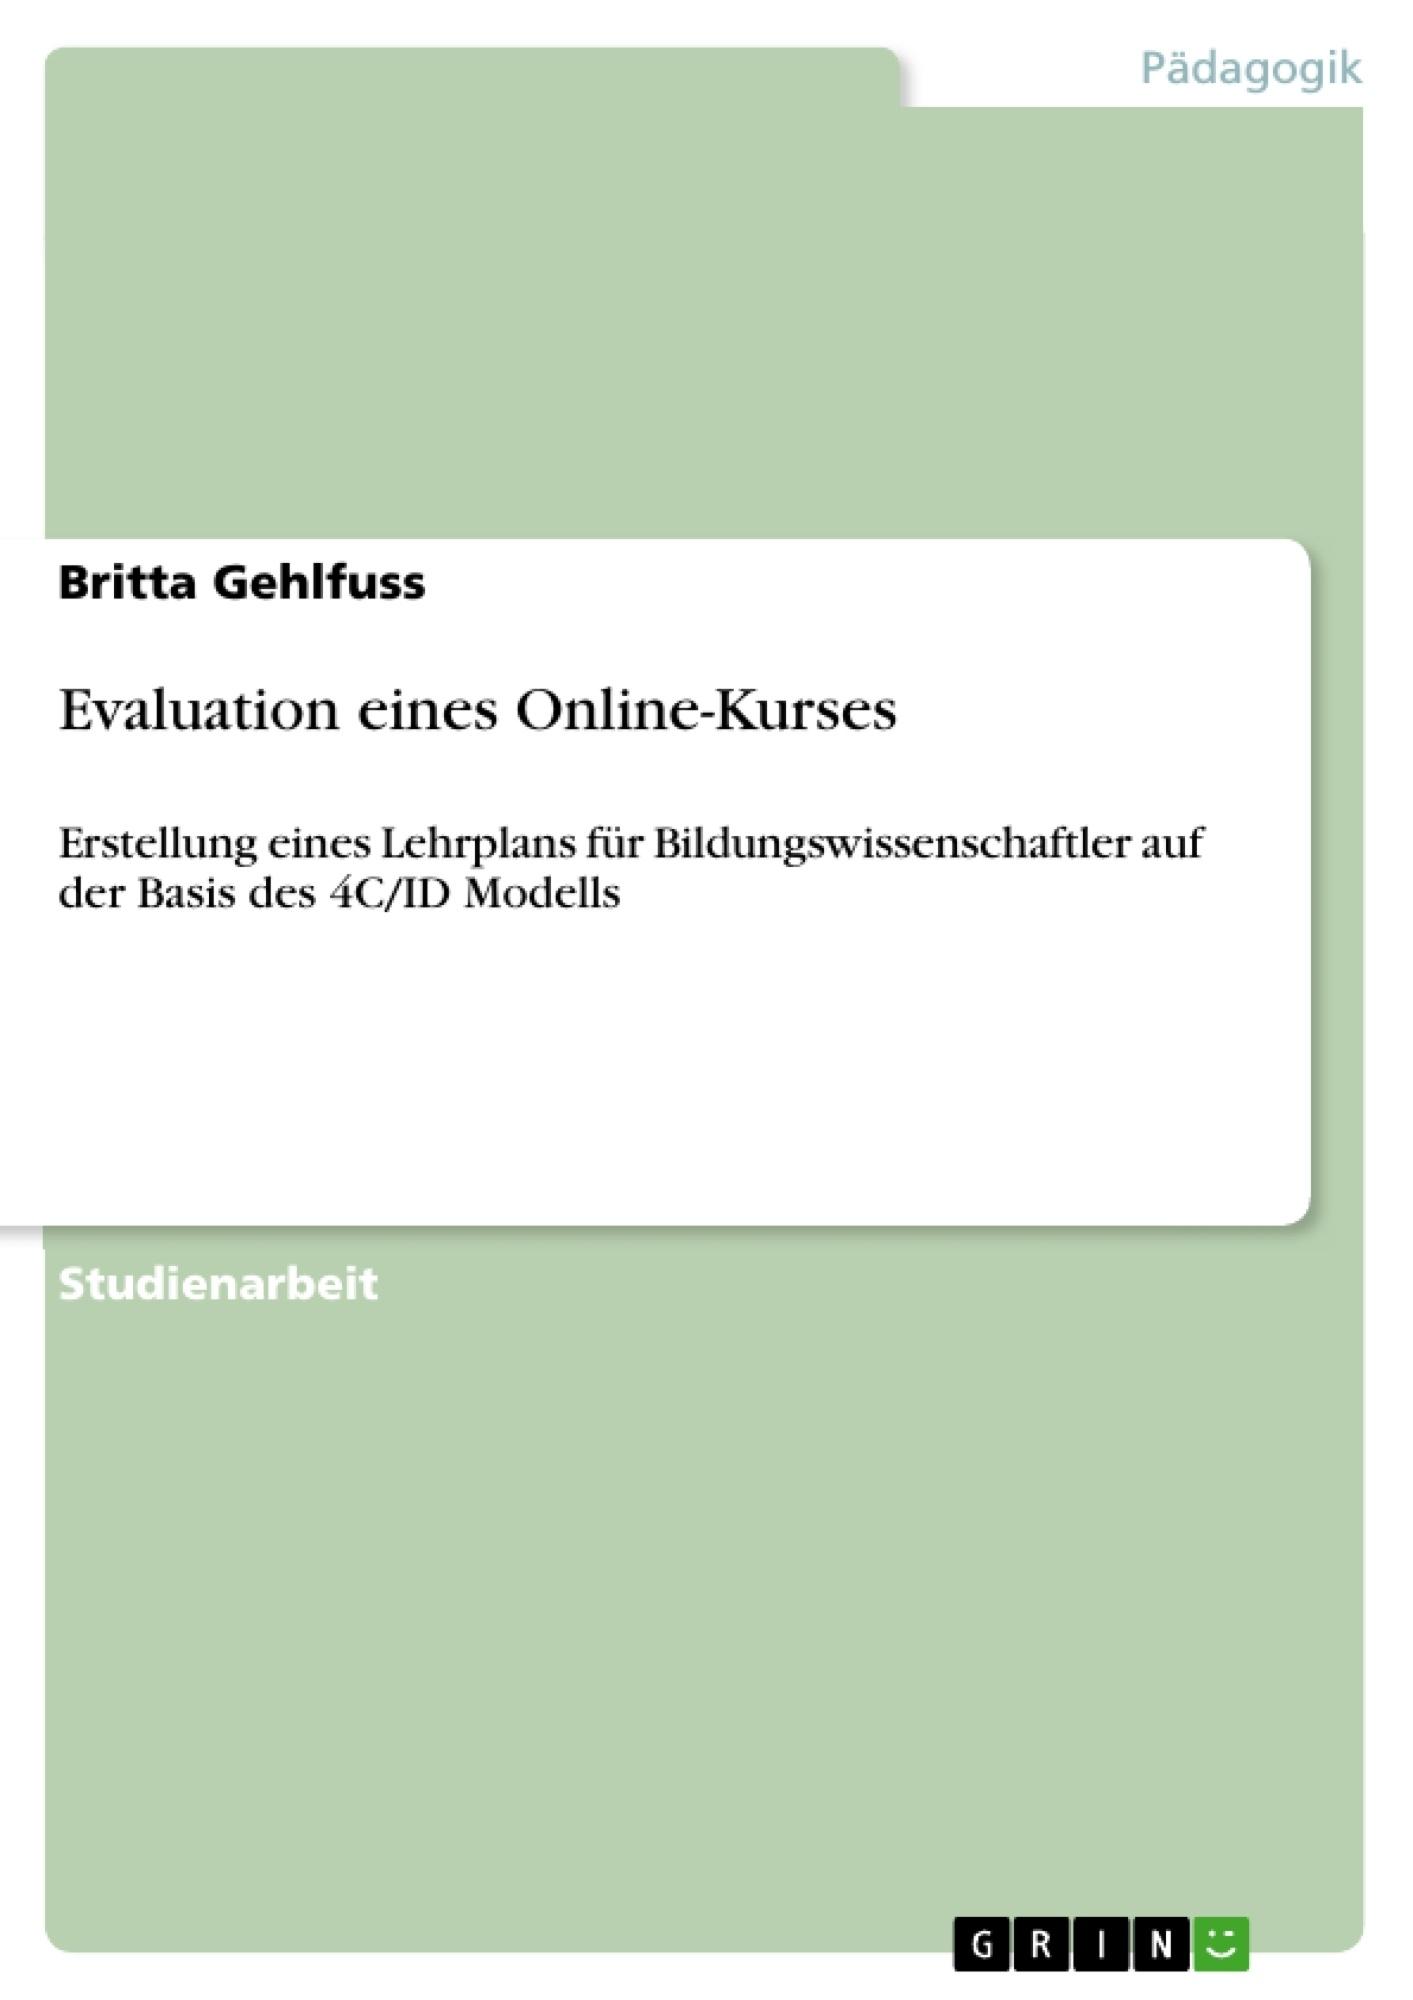 Titel: Evaluation eines Online-Kurses